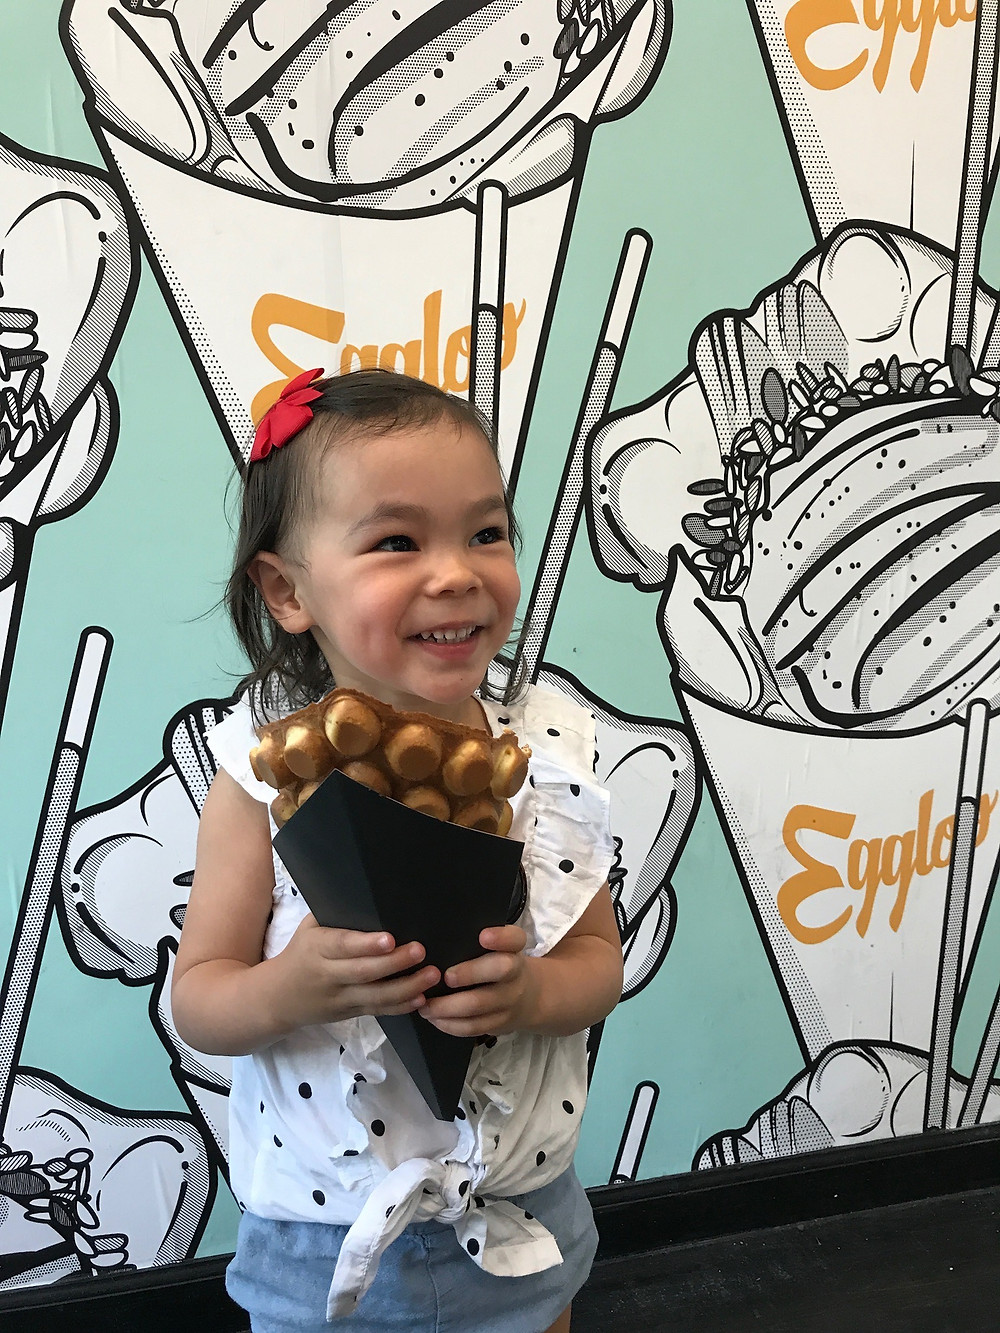 Eggloo, ice cream, East Village, Chinatown, food blogger, dessert, NYC kids, NYC summer